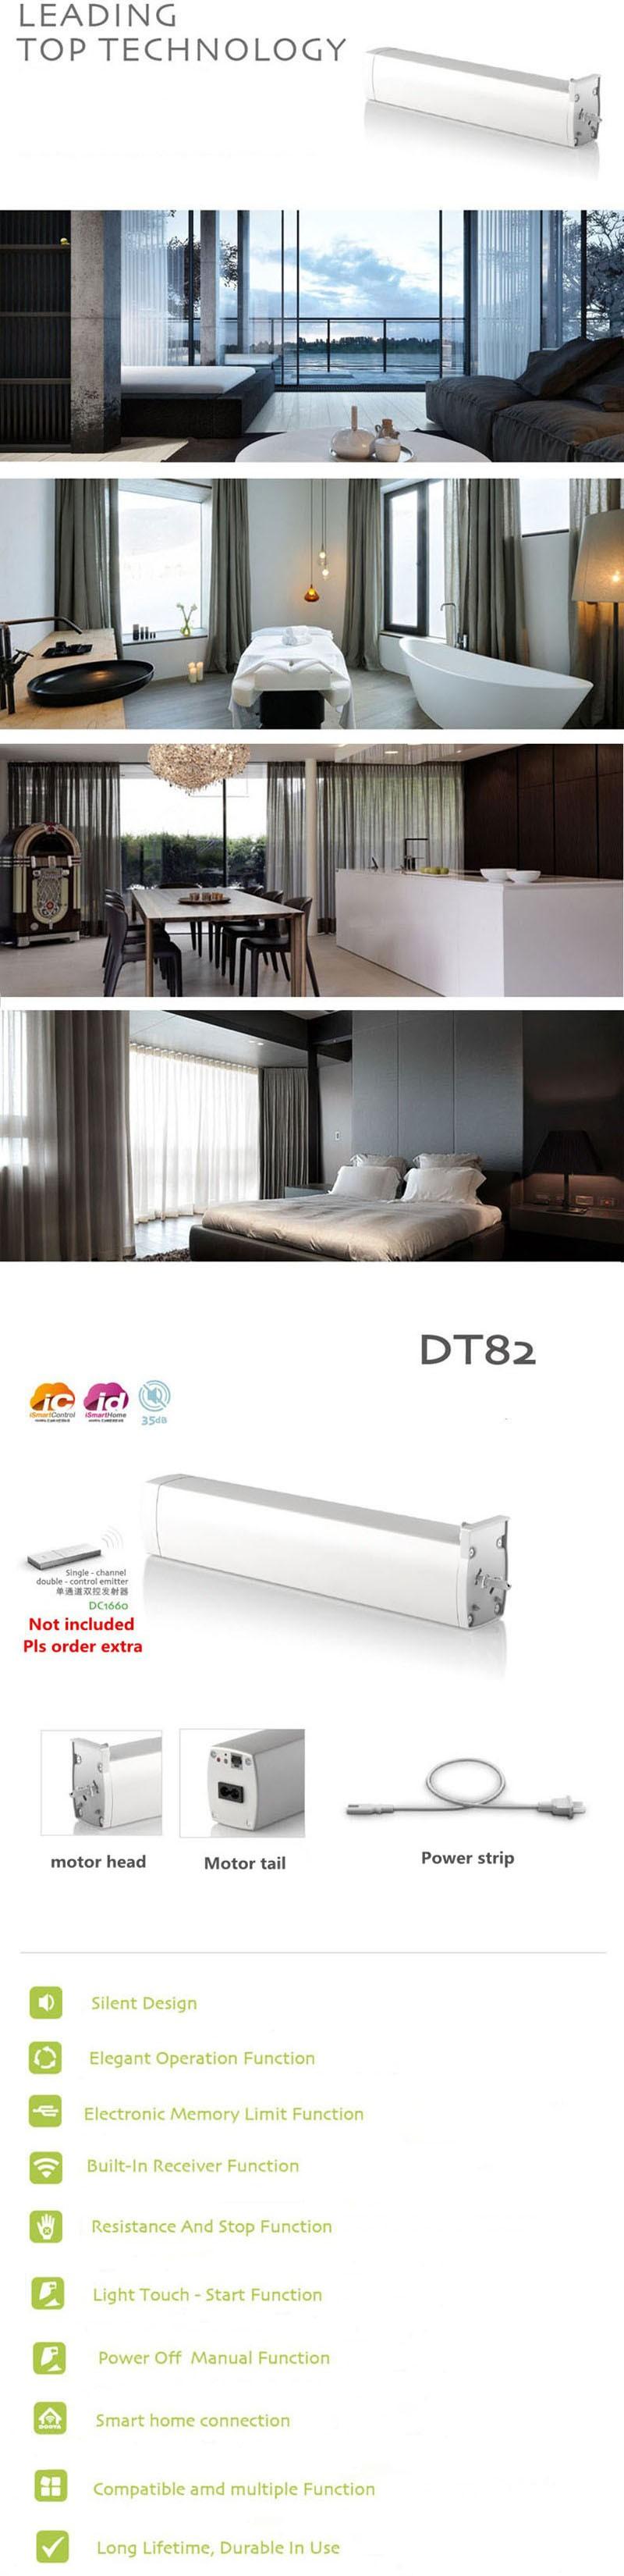 Original Dooya Electric Curtain Motor Smart Home Automation DT82TN Super quiet DC Curtain Motor